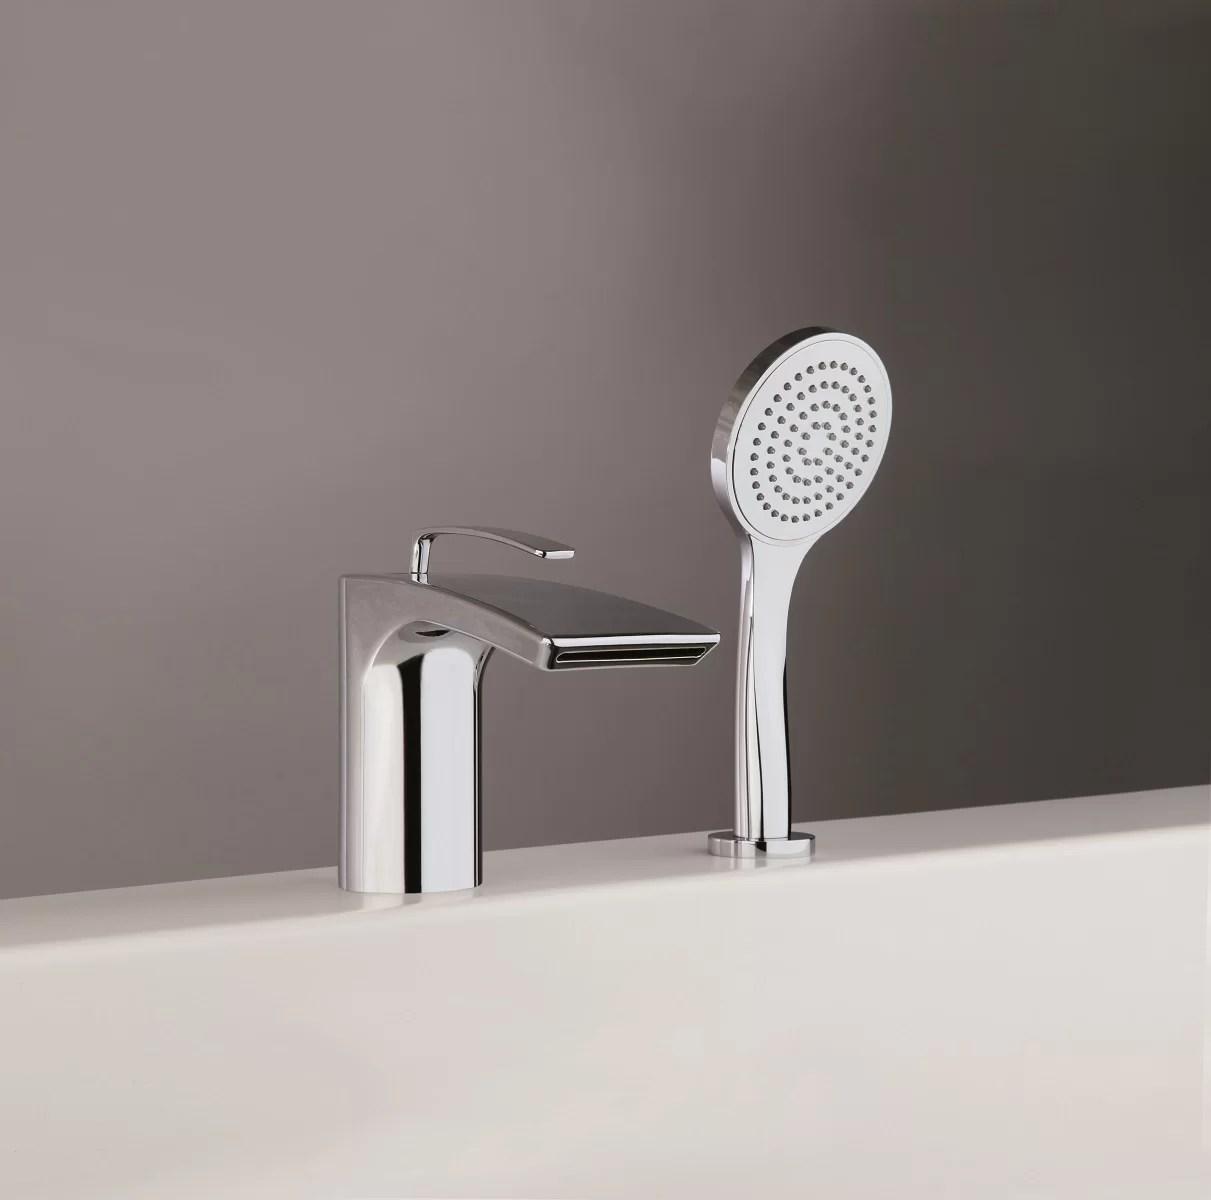 bollicine single handle deck mounted roman tub faucet trim trim with handshower